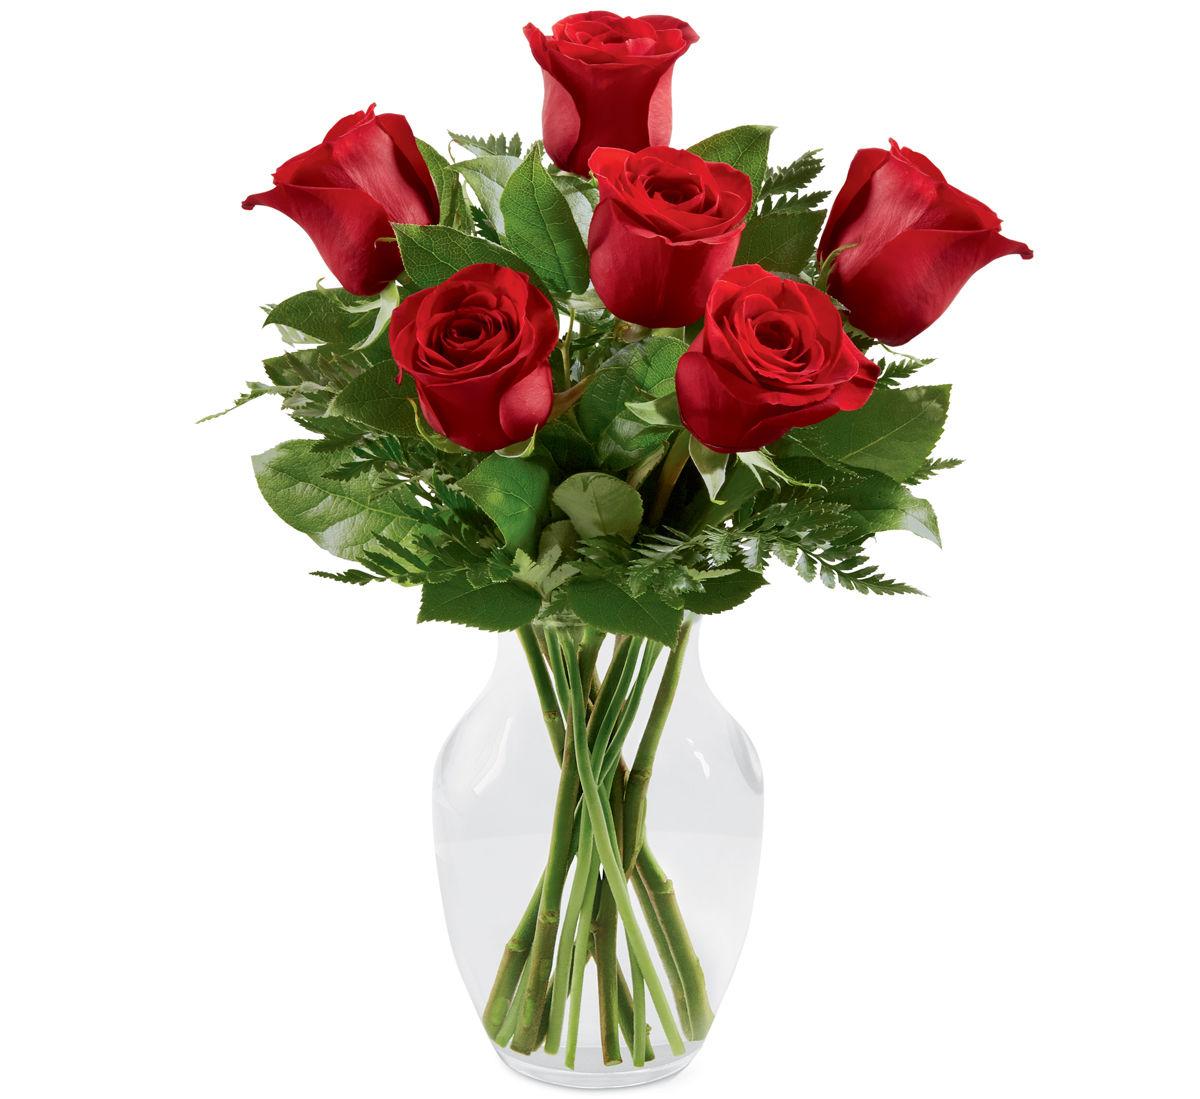 Roses Long Stem Roses Red Roses Canada Flowers